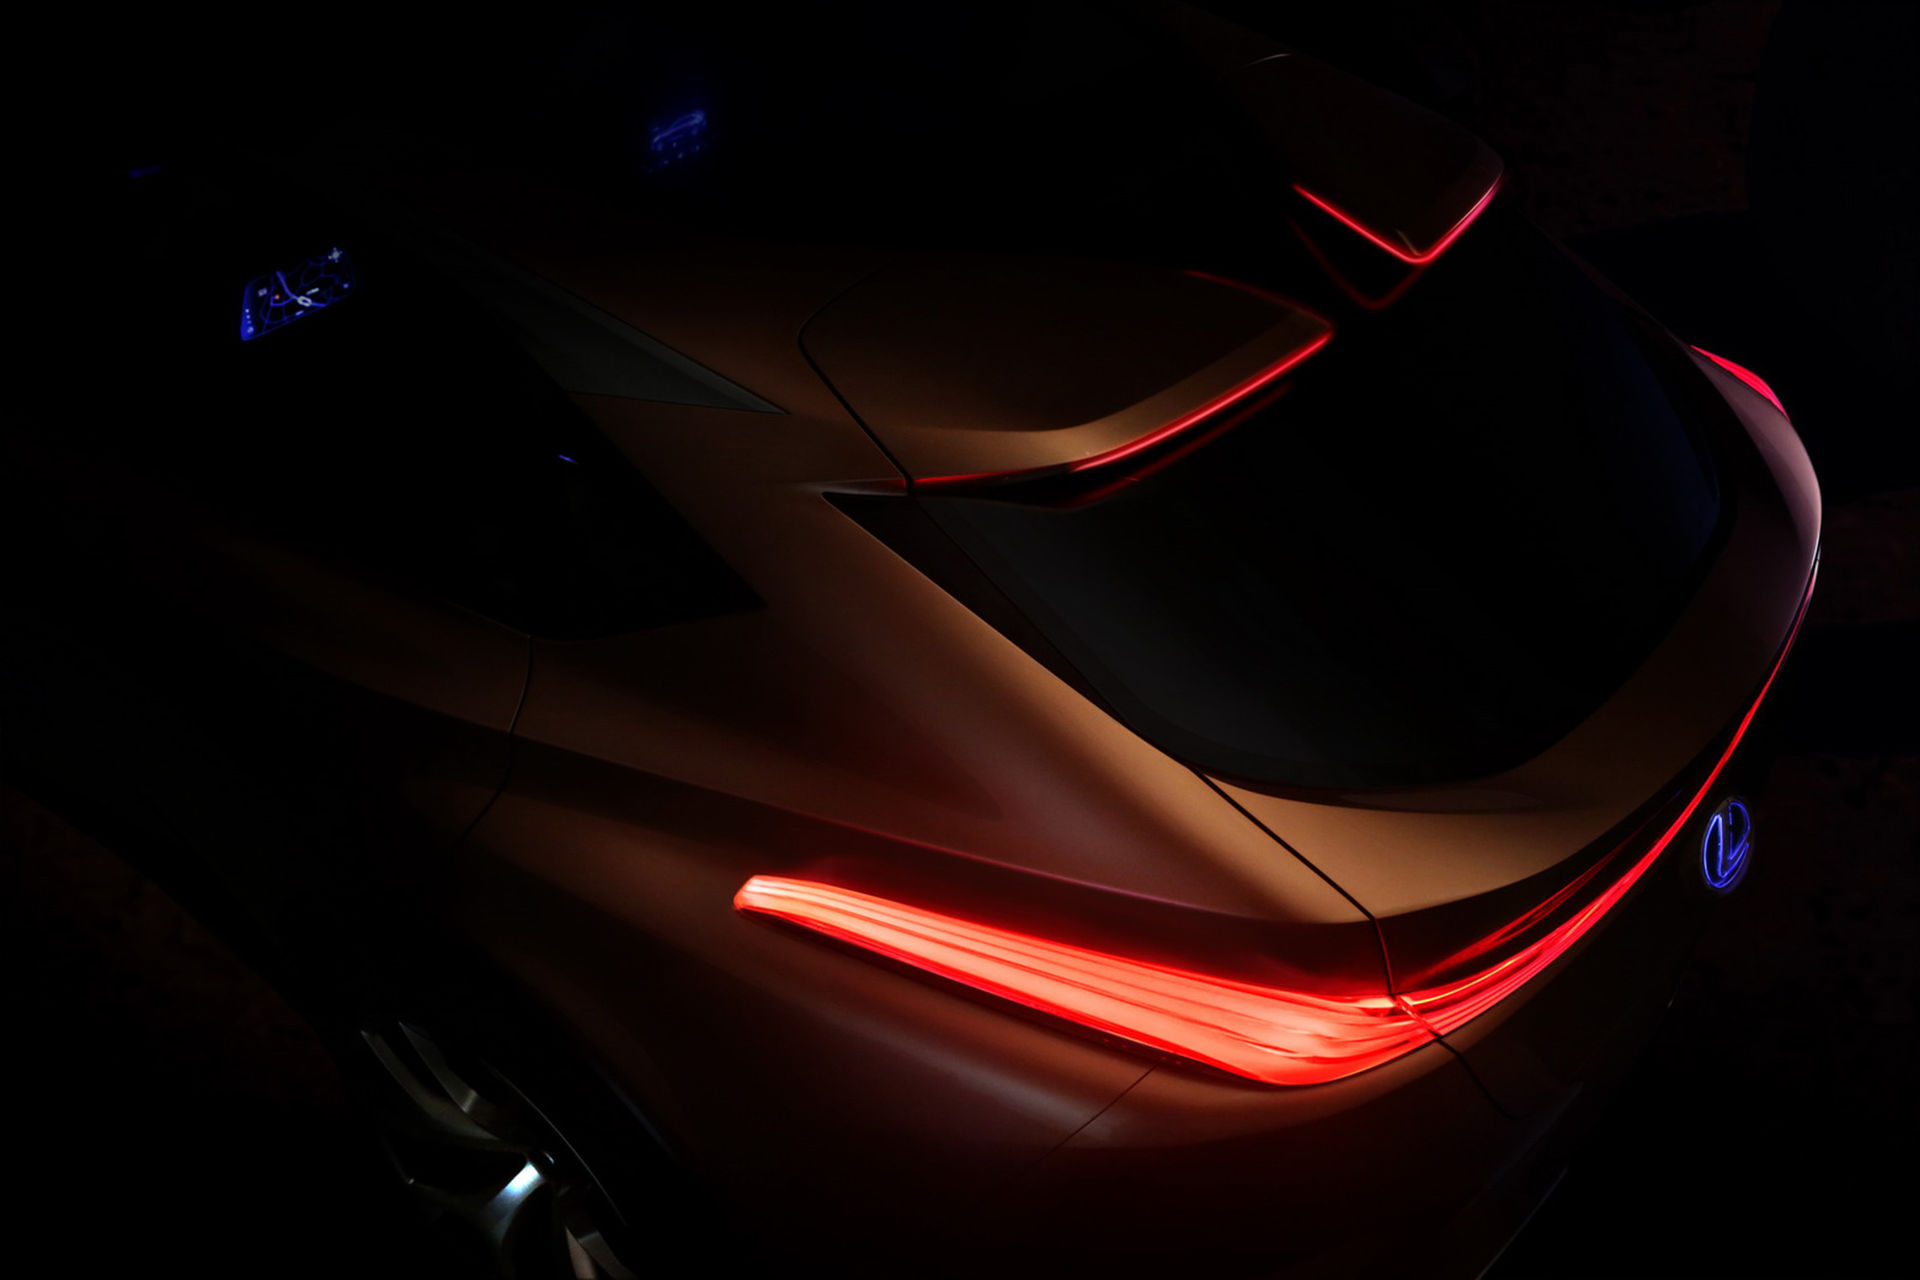 Lexus visar lite av konceptbilen LF-1 Limitless